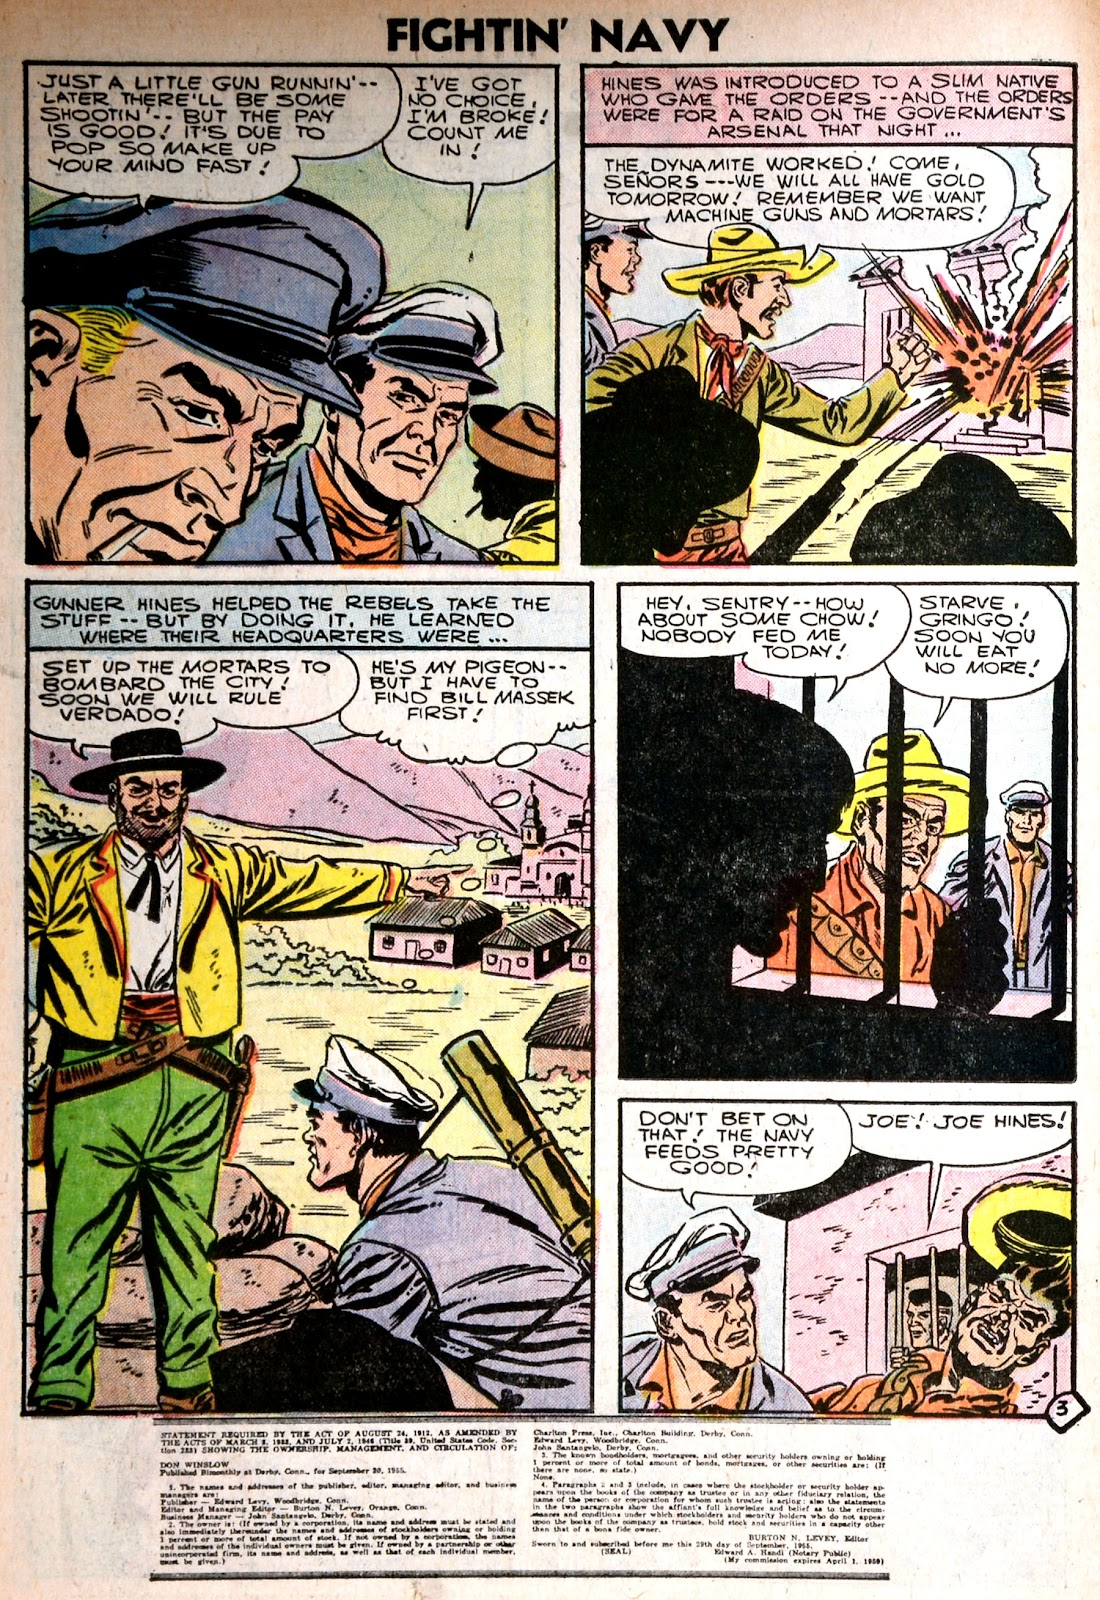 Read online Fightin' Navy comic -  Issue #75 - 26